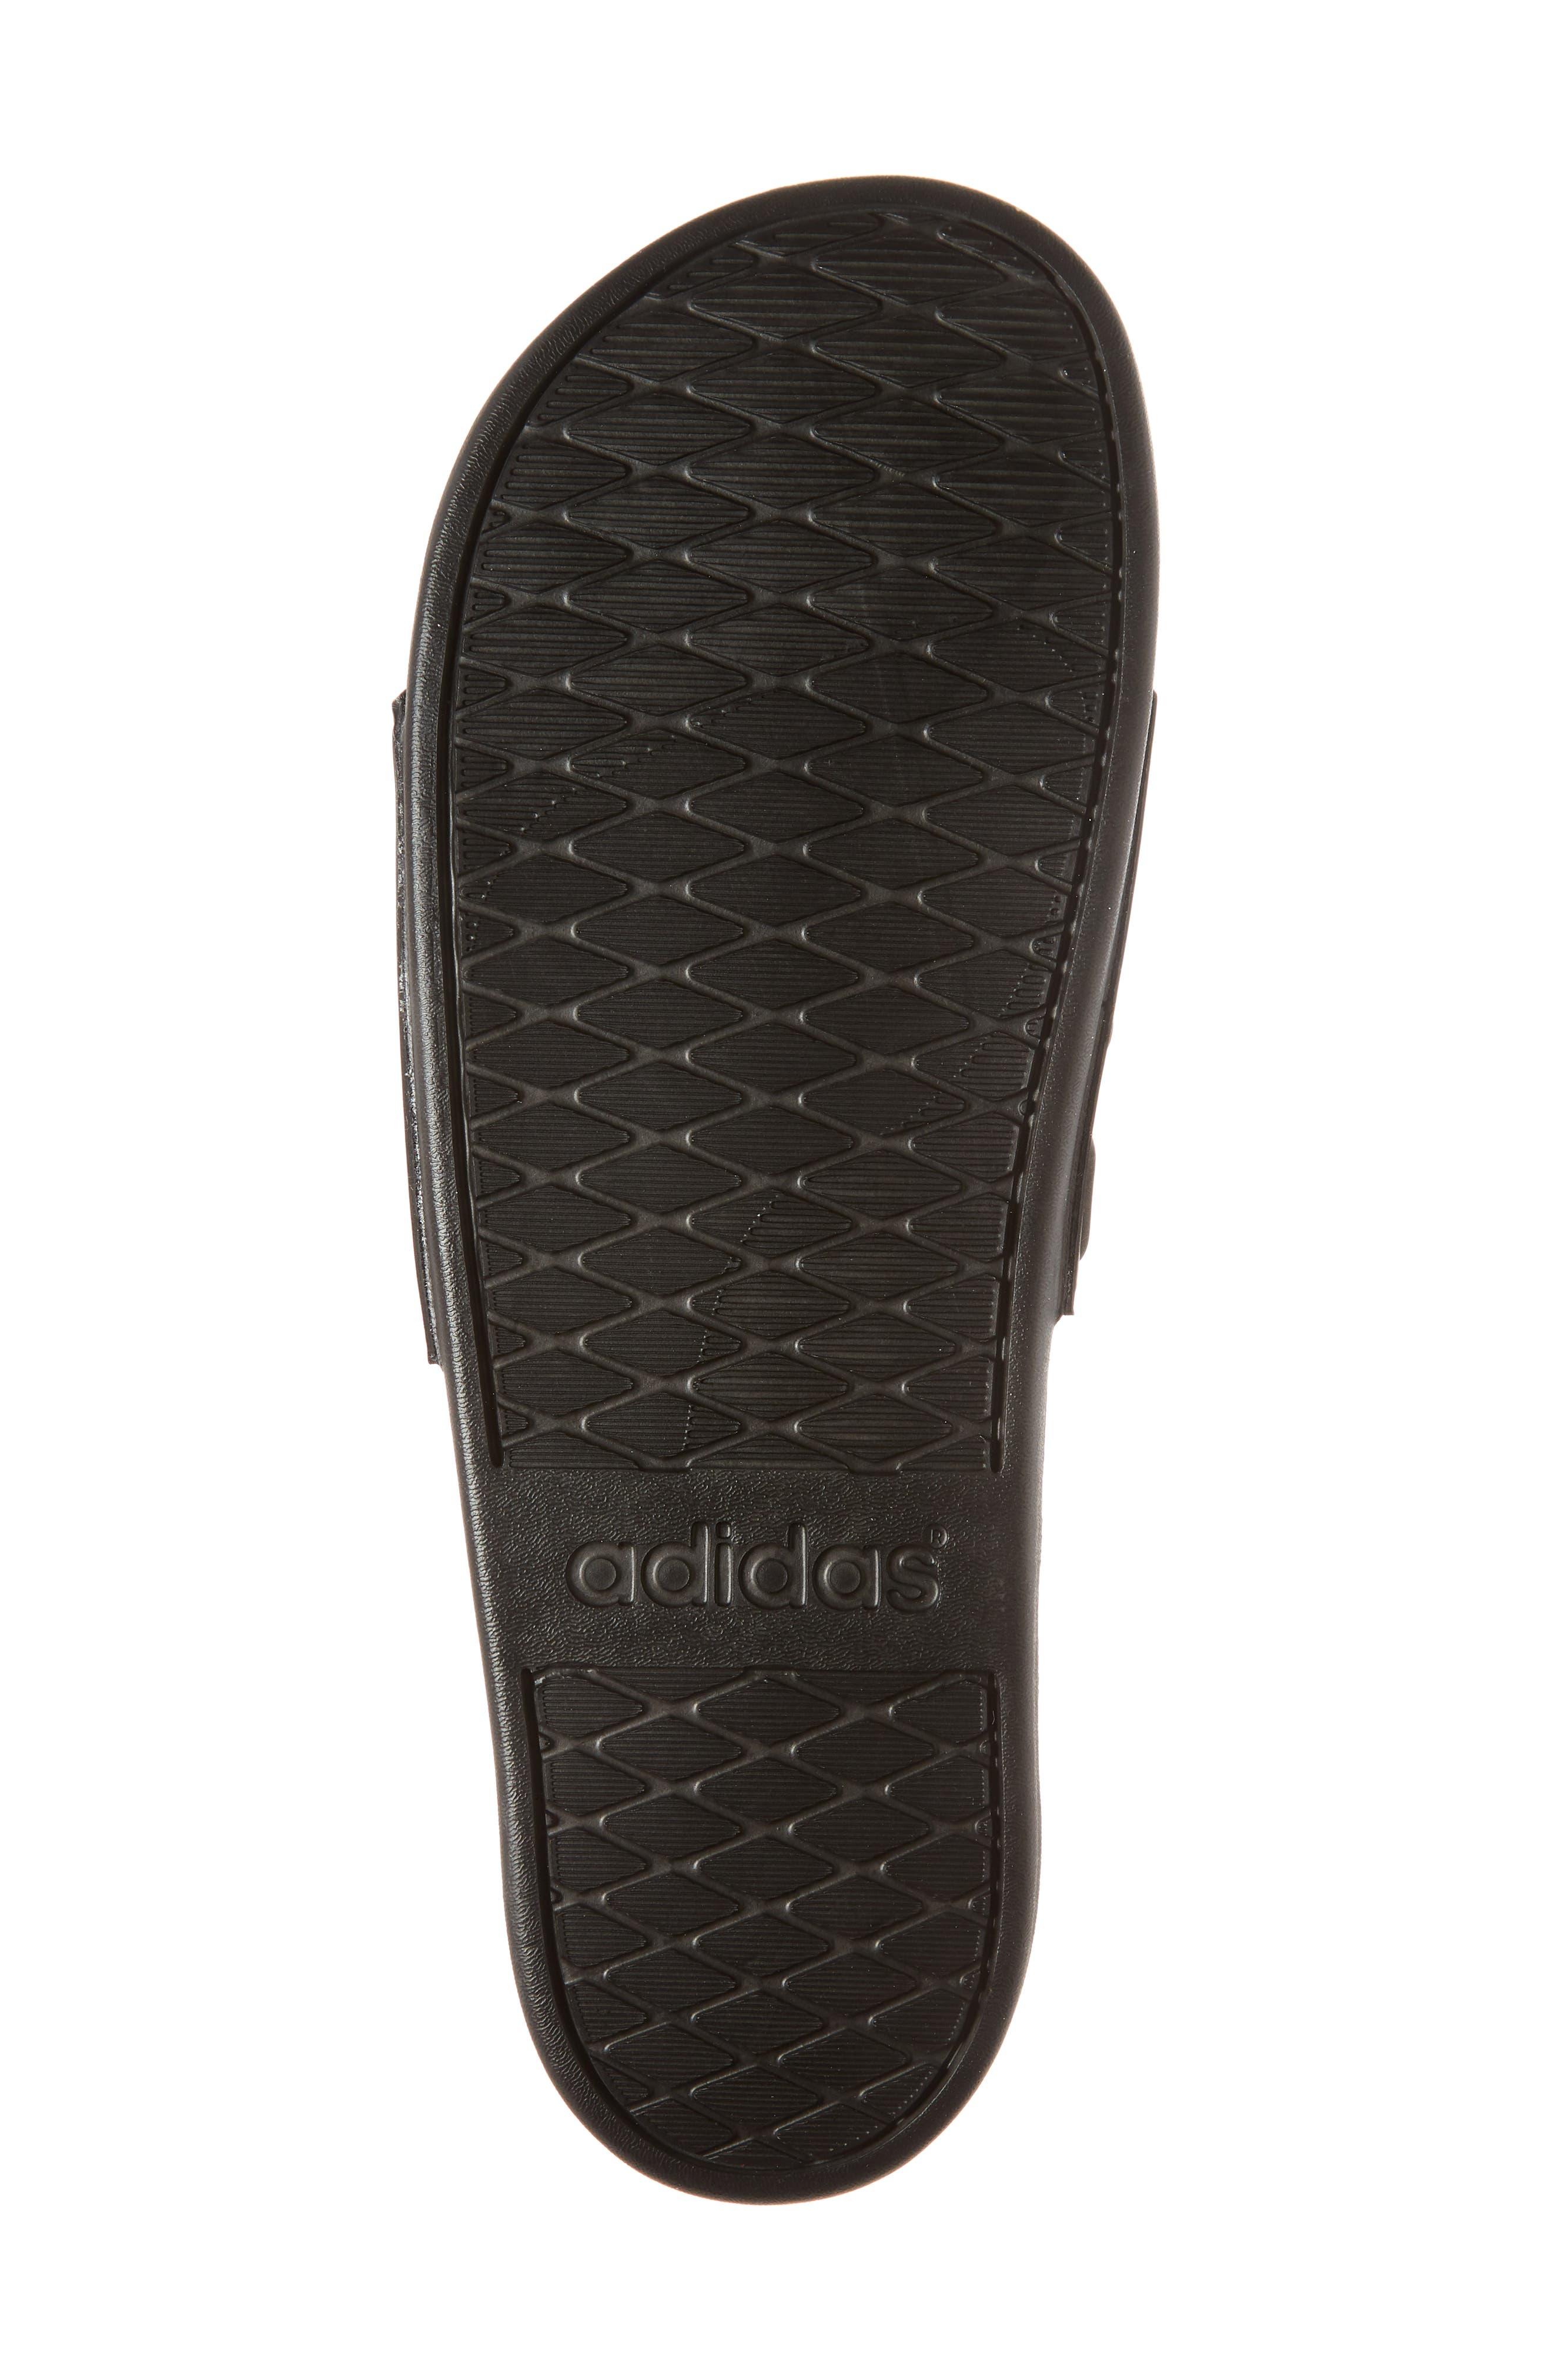 ADIDAS, Adilette Cloudfoam Mono Sport Slide Sandal, Alternate thumbnail 6, color, BLACK/ BLACK